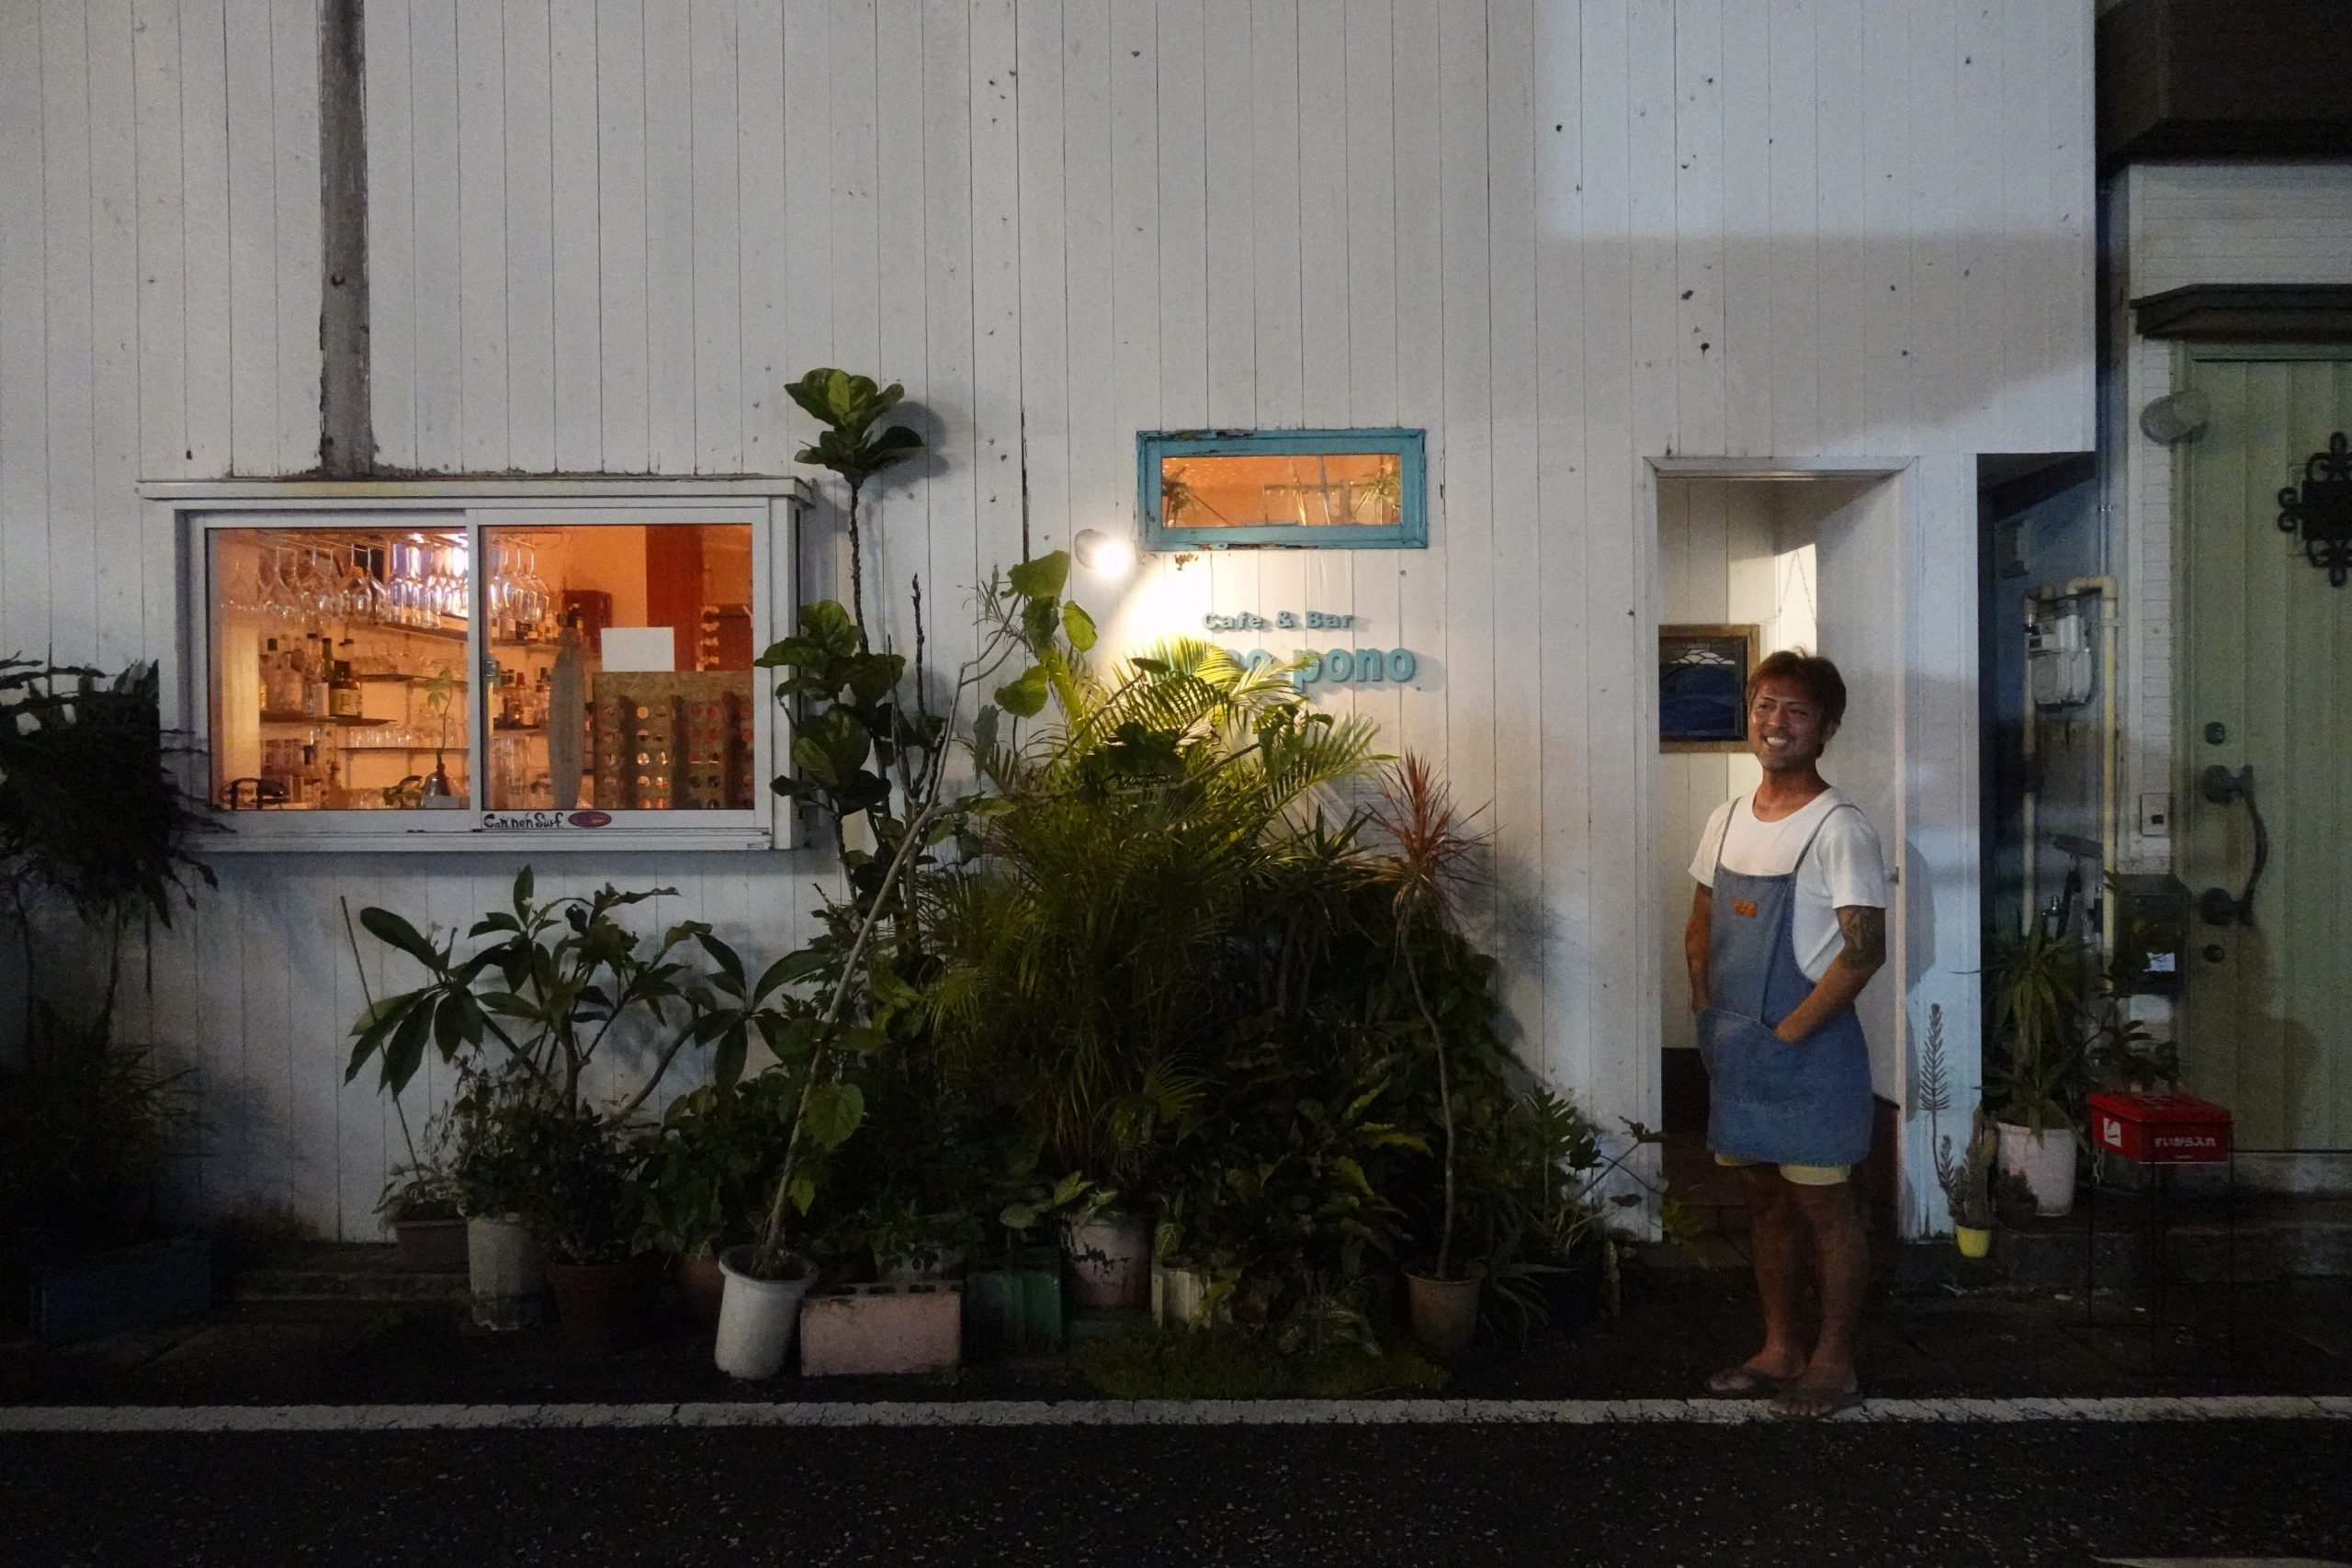 奄美大島ponpono02